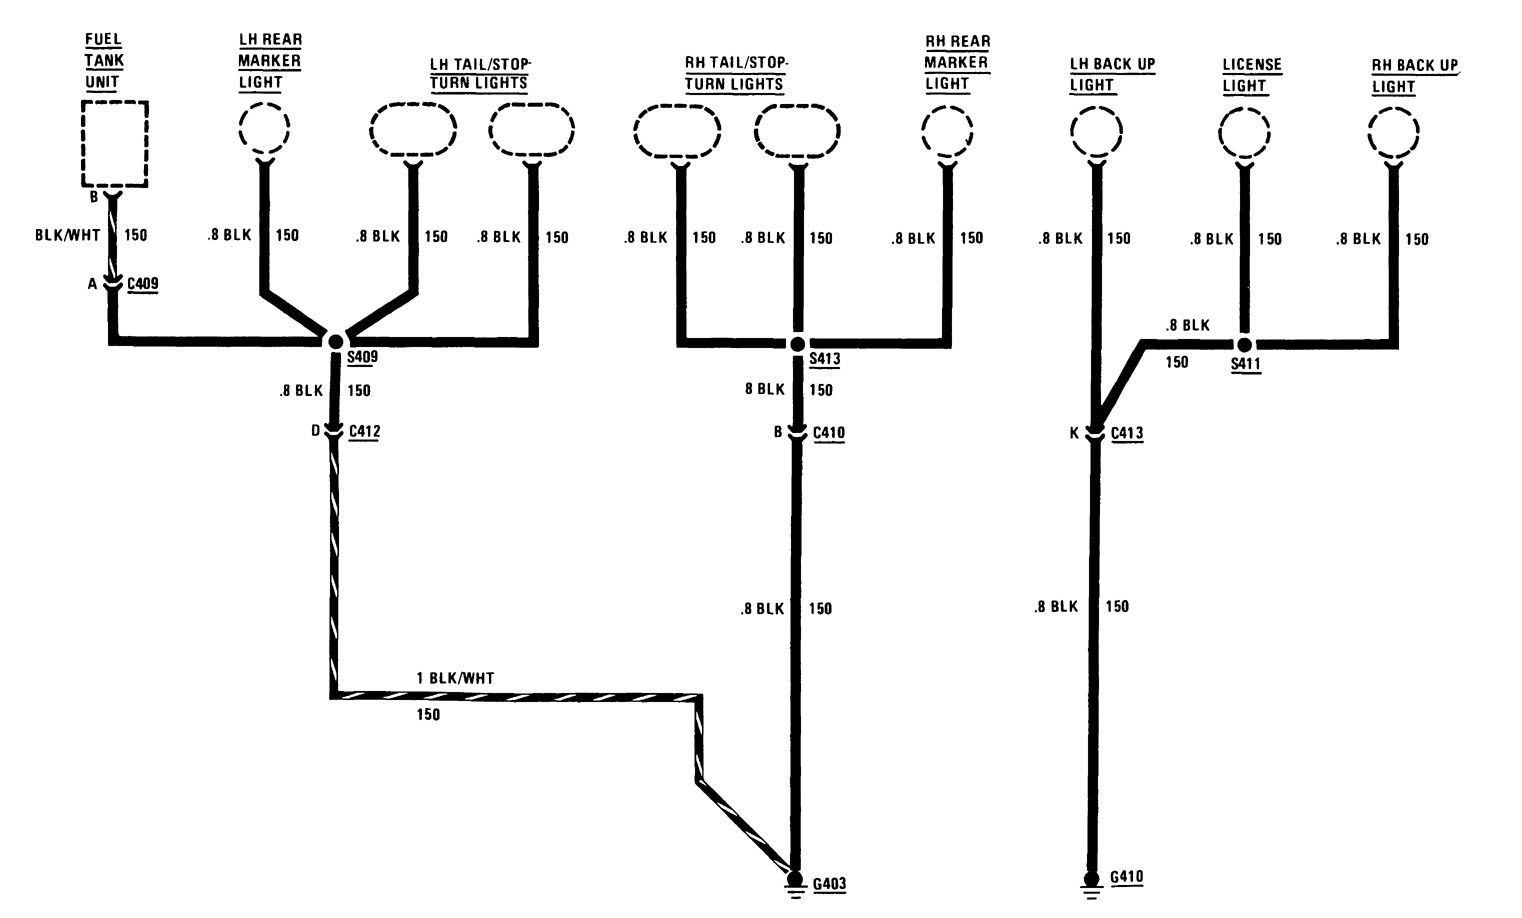 hight resolution of buick century wiring diagram ground distribution